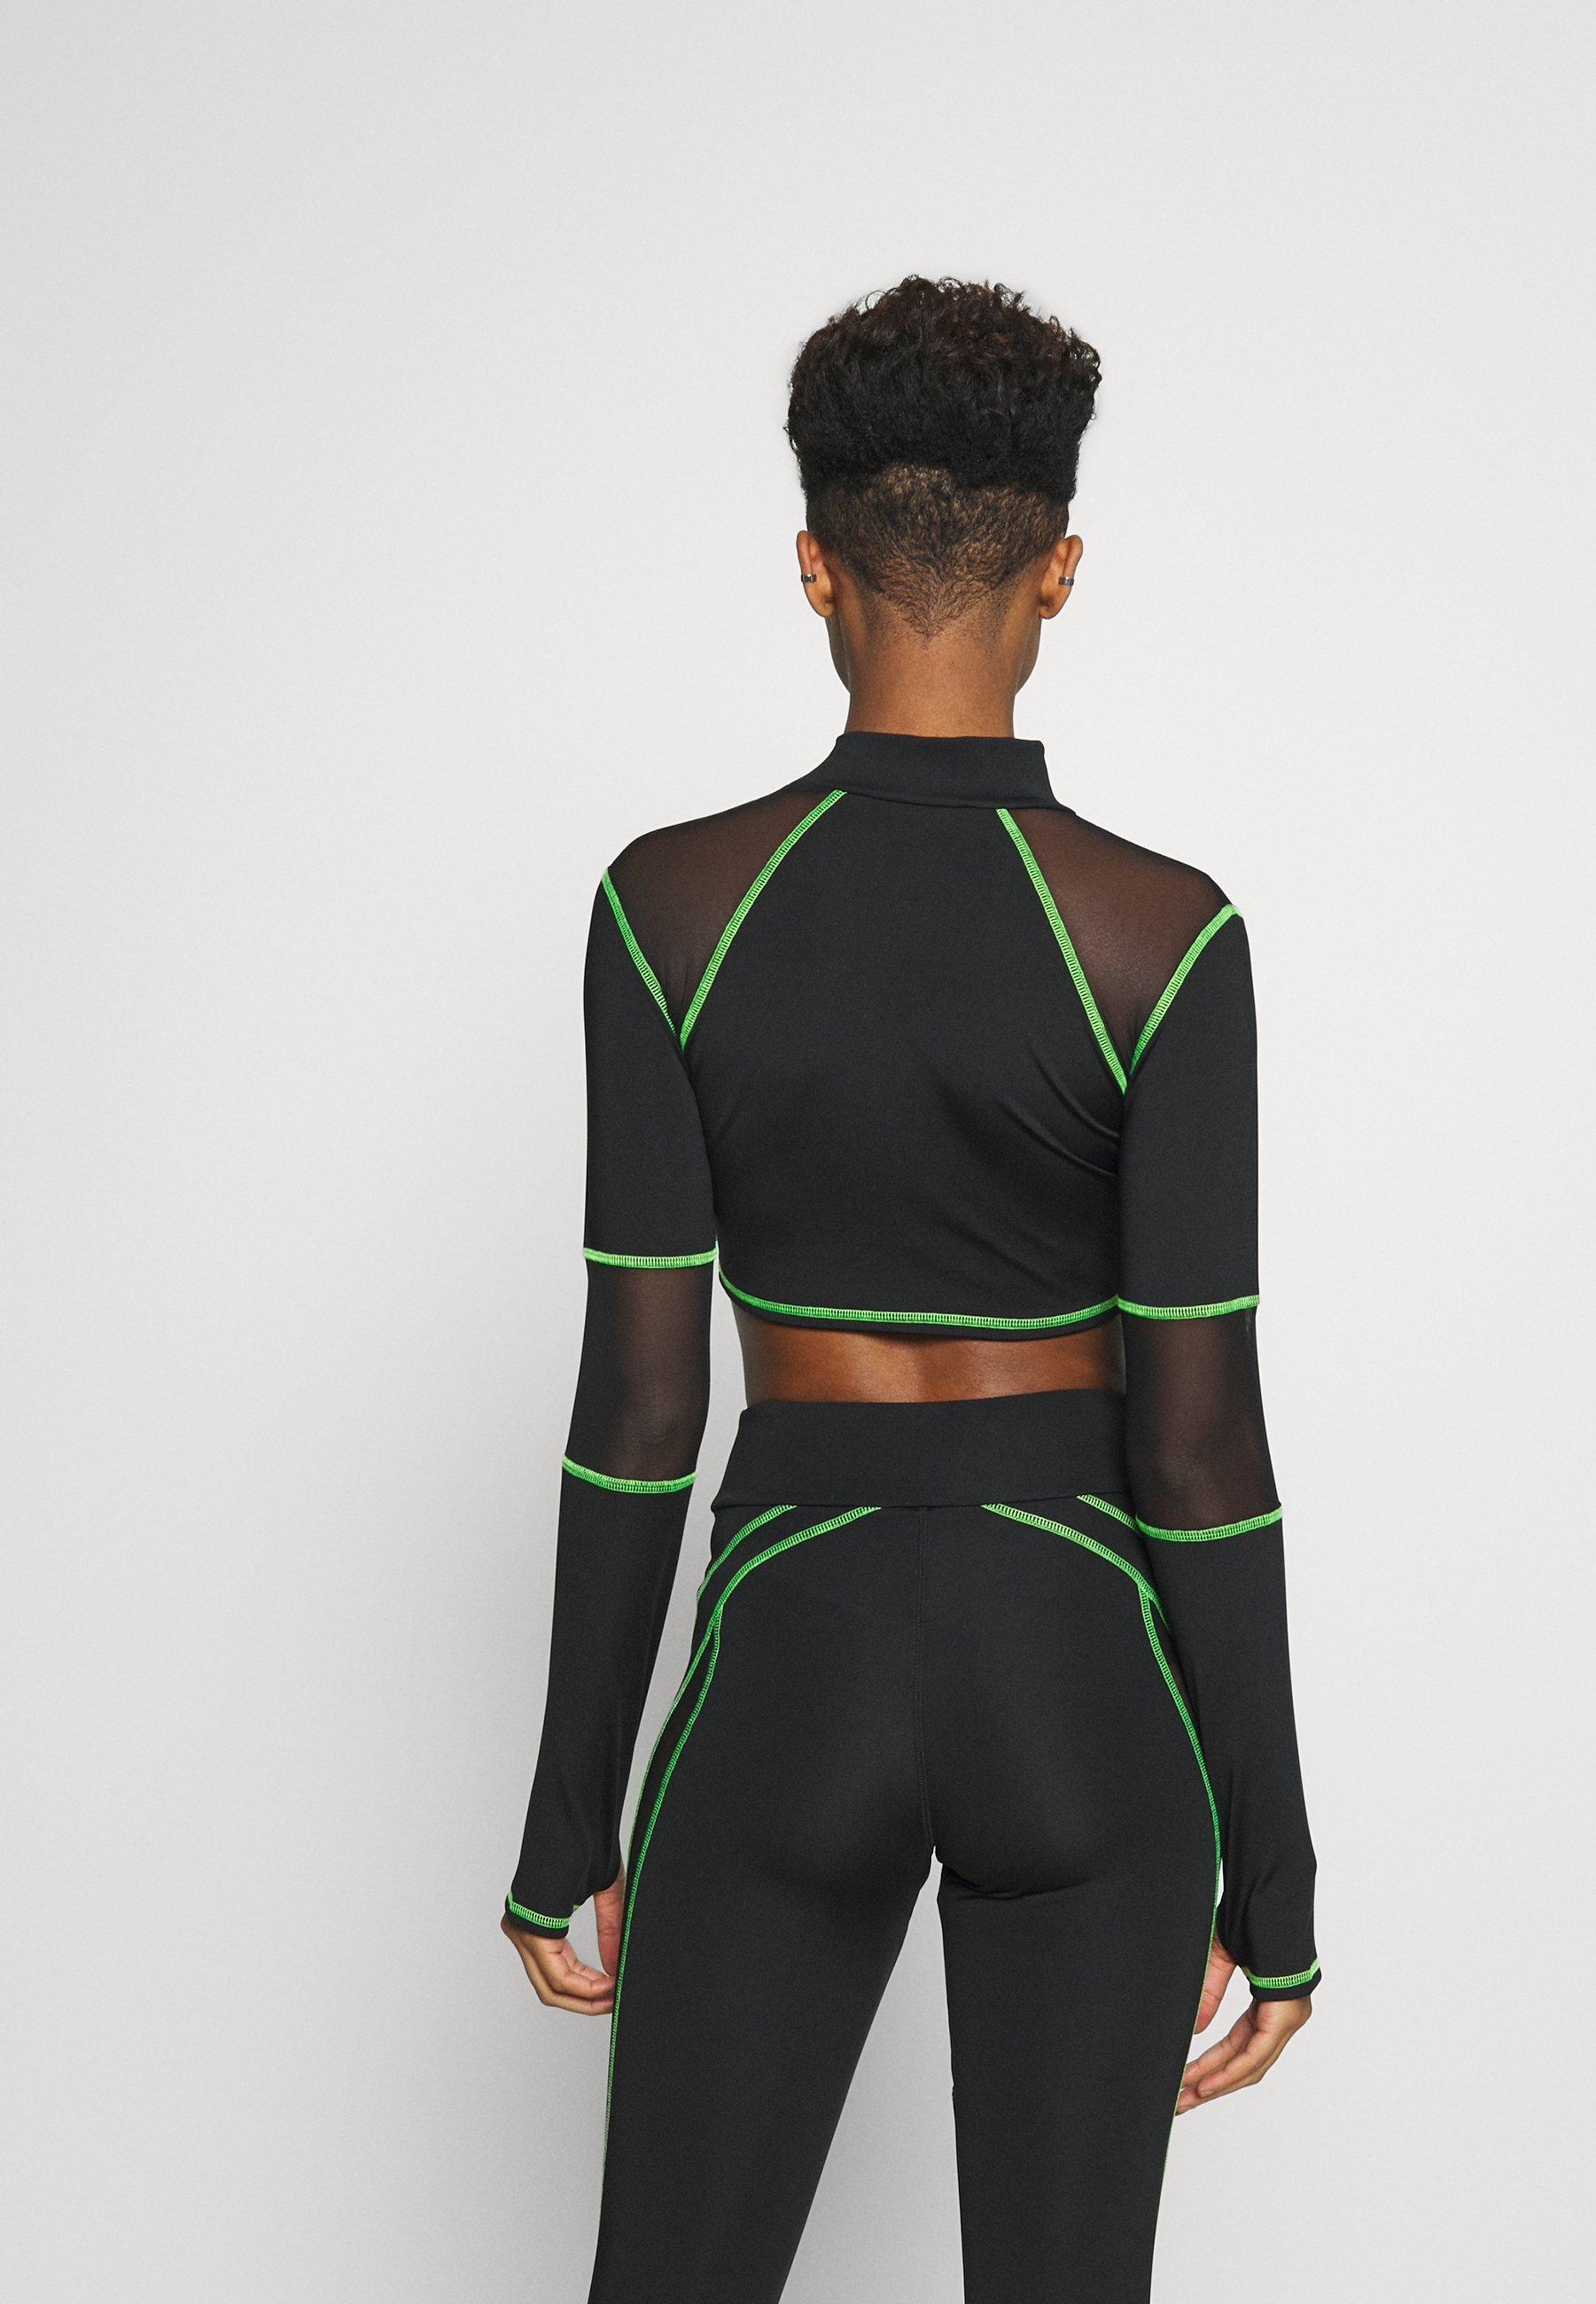 Jaded London Sport High Neck Long Sleeve Top - Långärmad Tröja Green/black